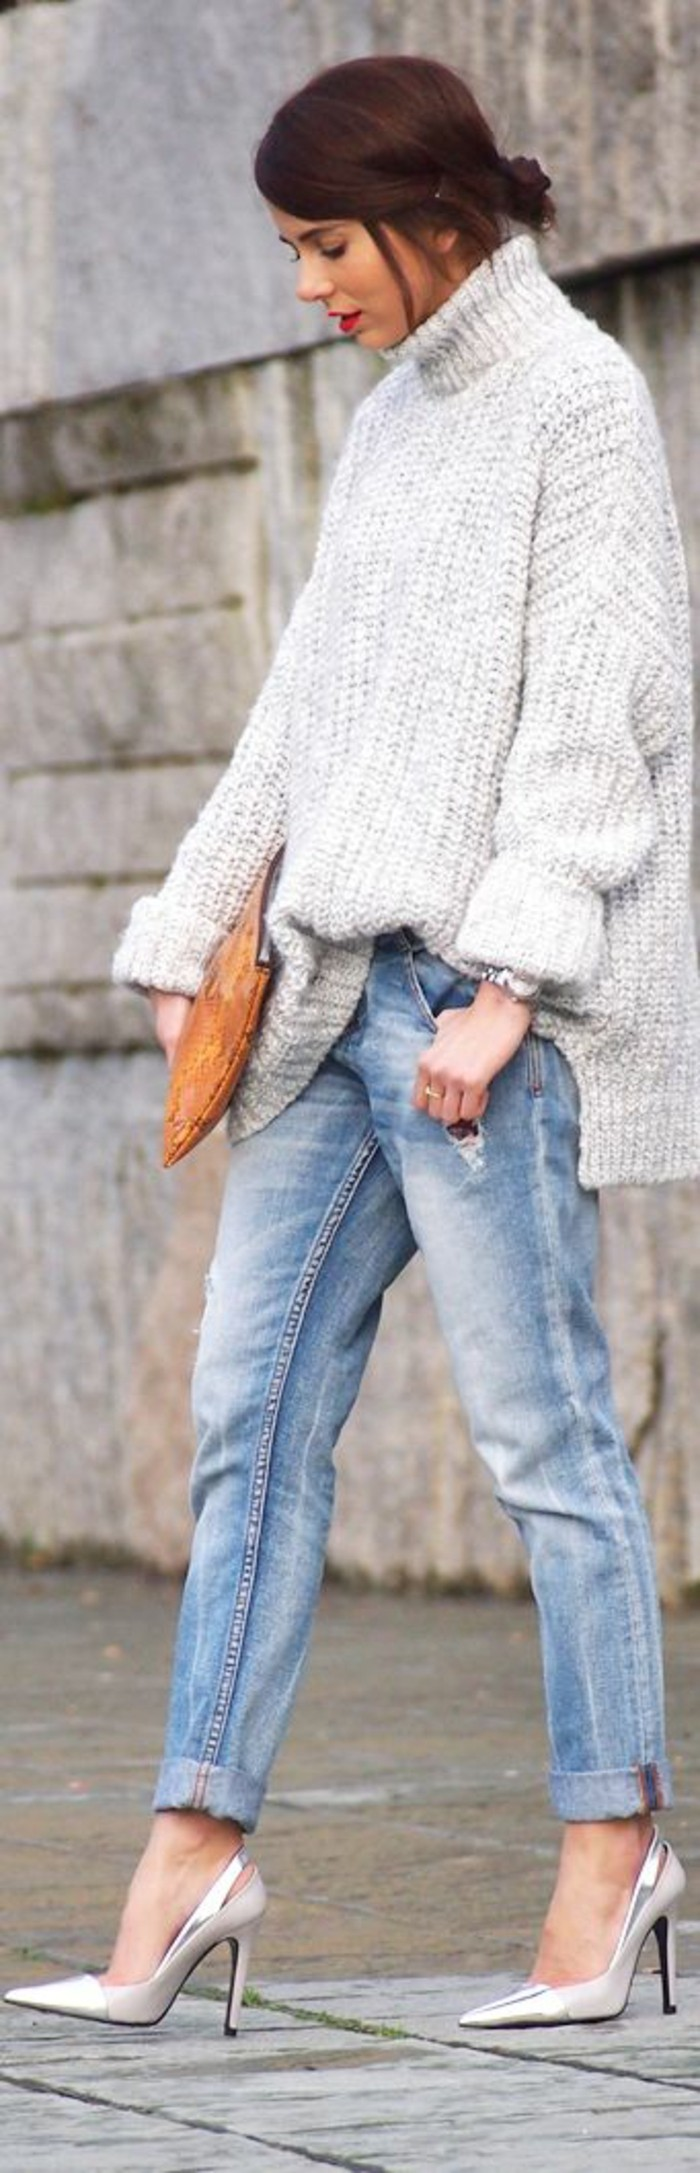 style-decontracte-jean-et-pull-oversize-femme